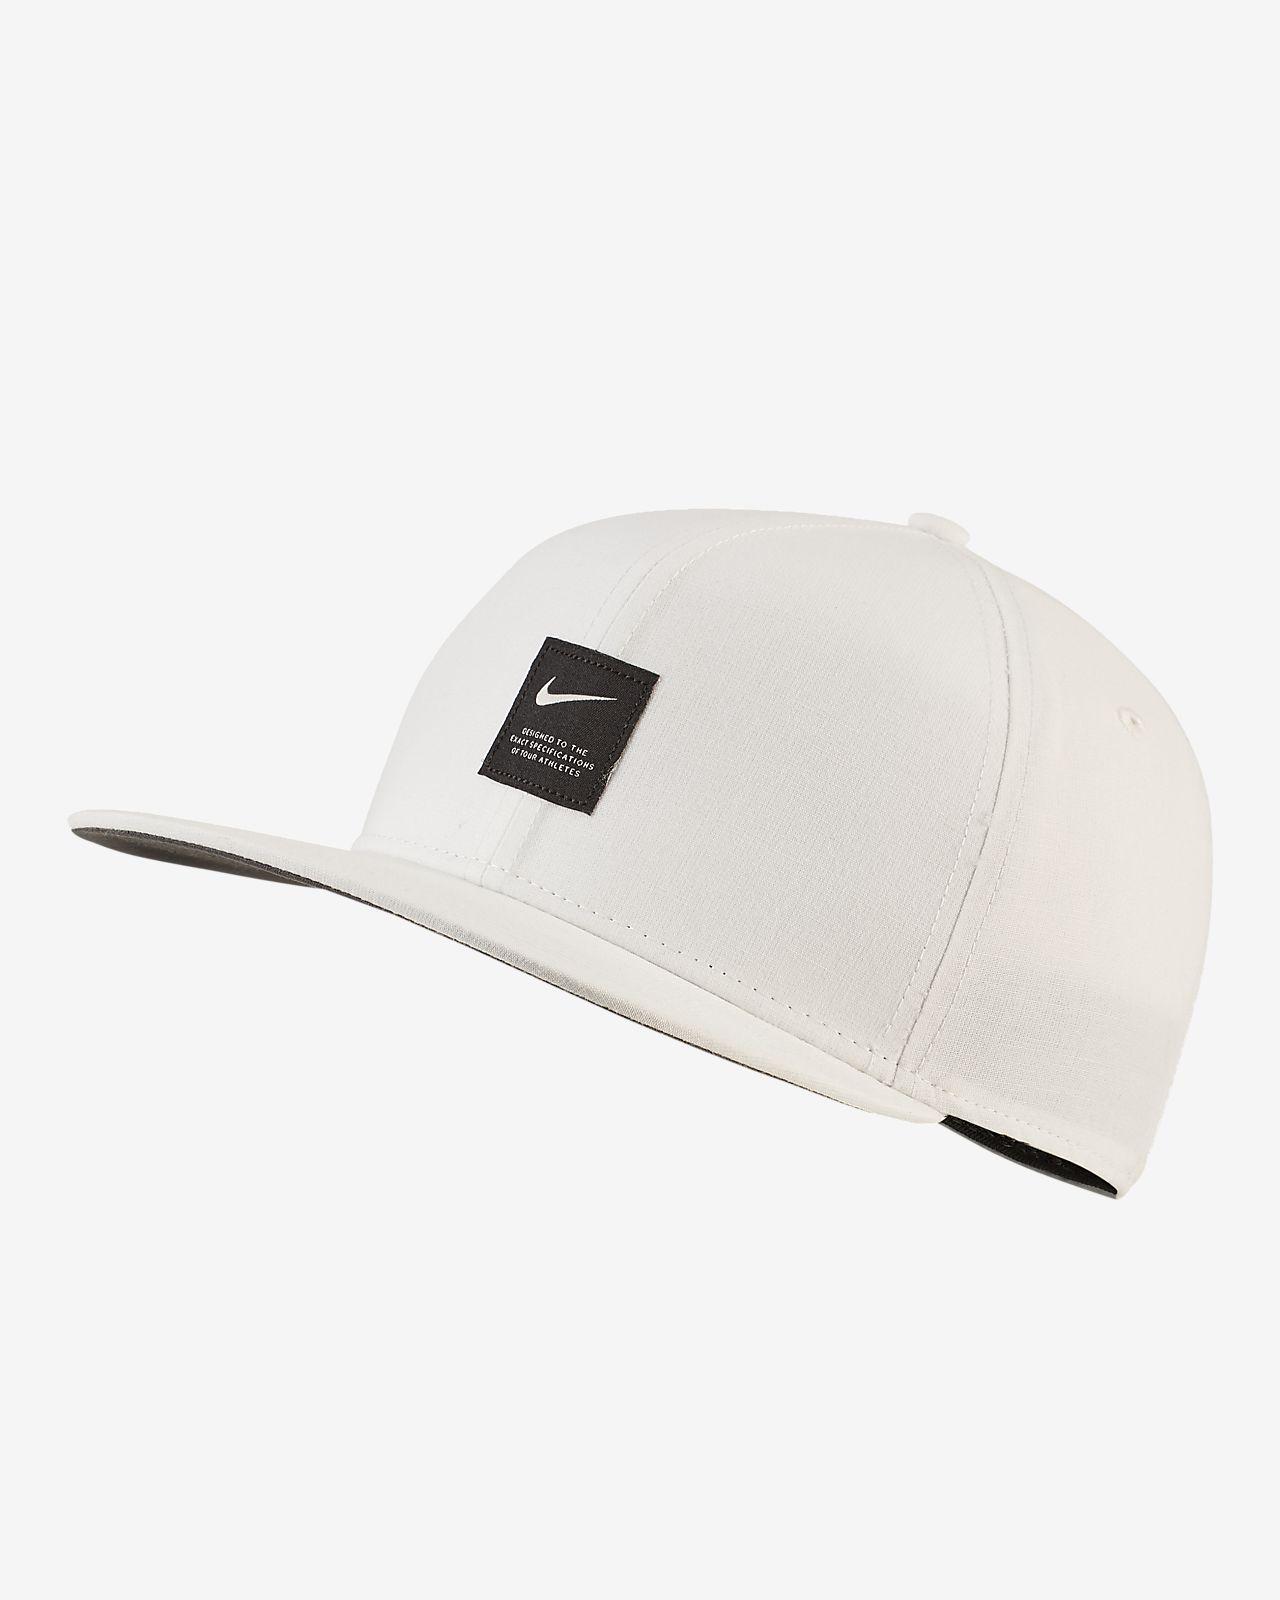 1c82605675850 Nike AeroBill Golf Hat. Nike.com